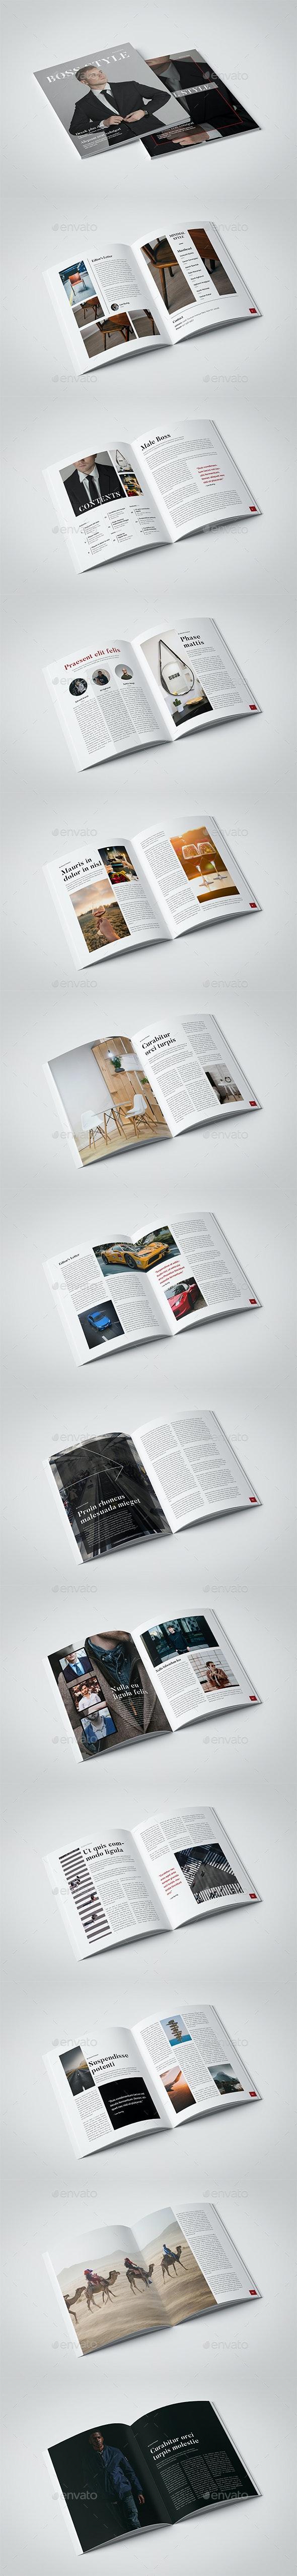 InDesign Leisure Magazine Template - Magazines Print Templates